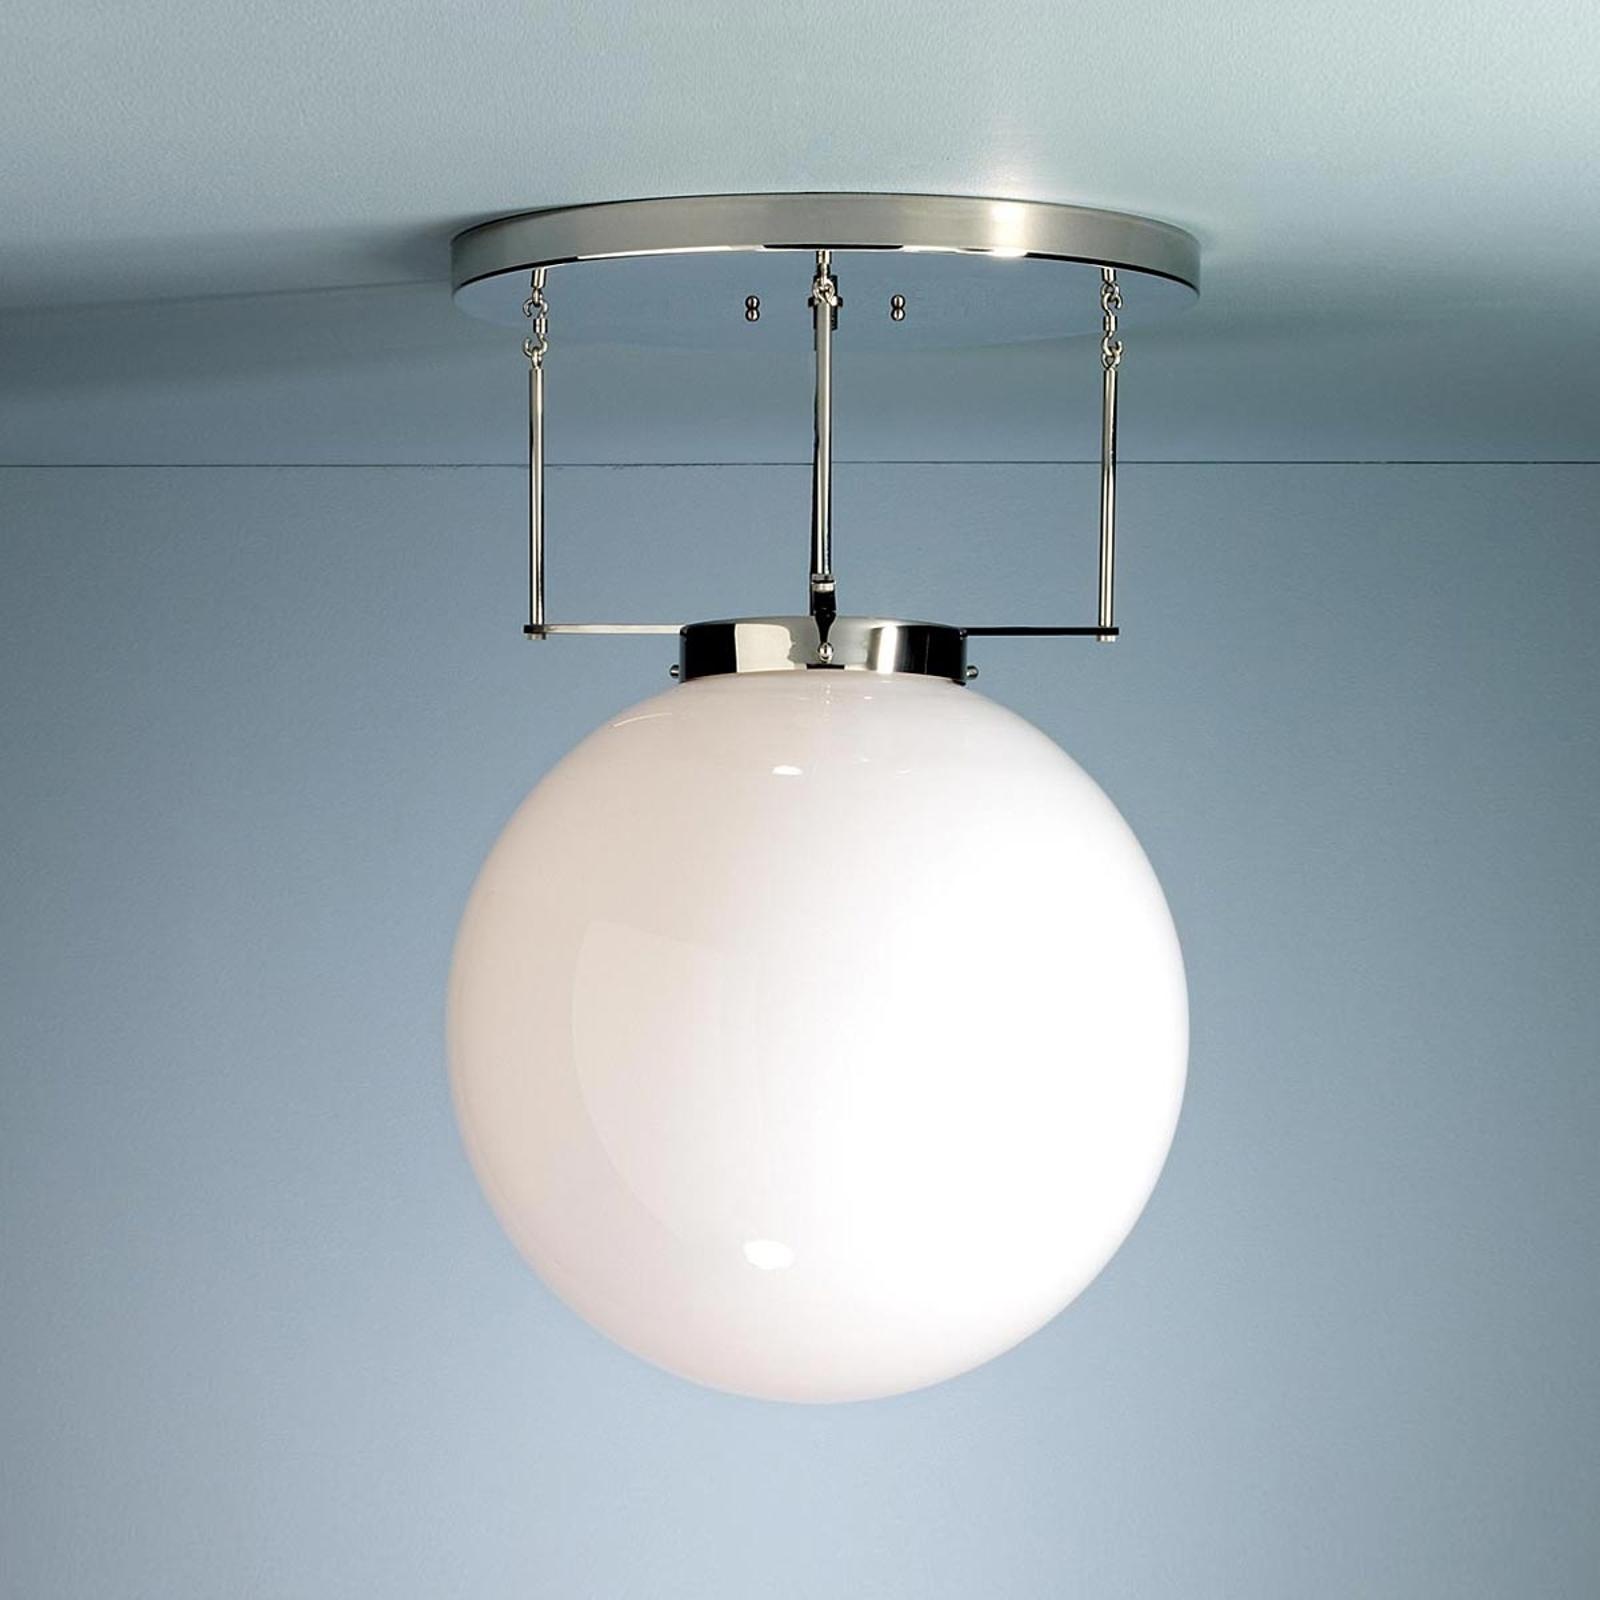 Lampa sufitowa Brandt w stylu Bauhaus 35 cm nikiel